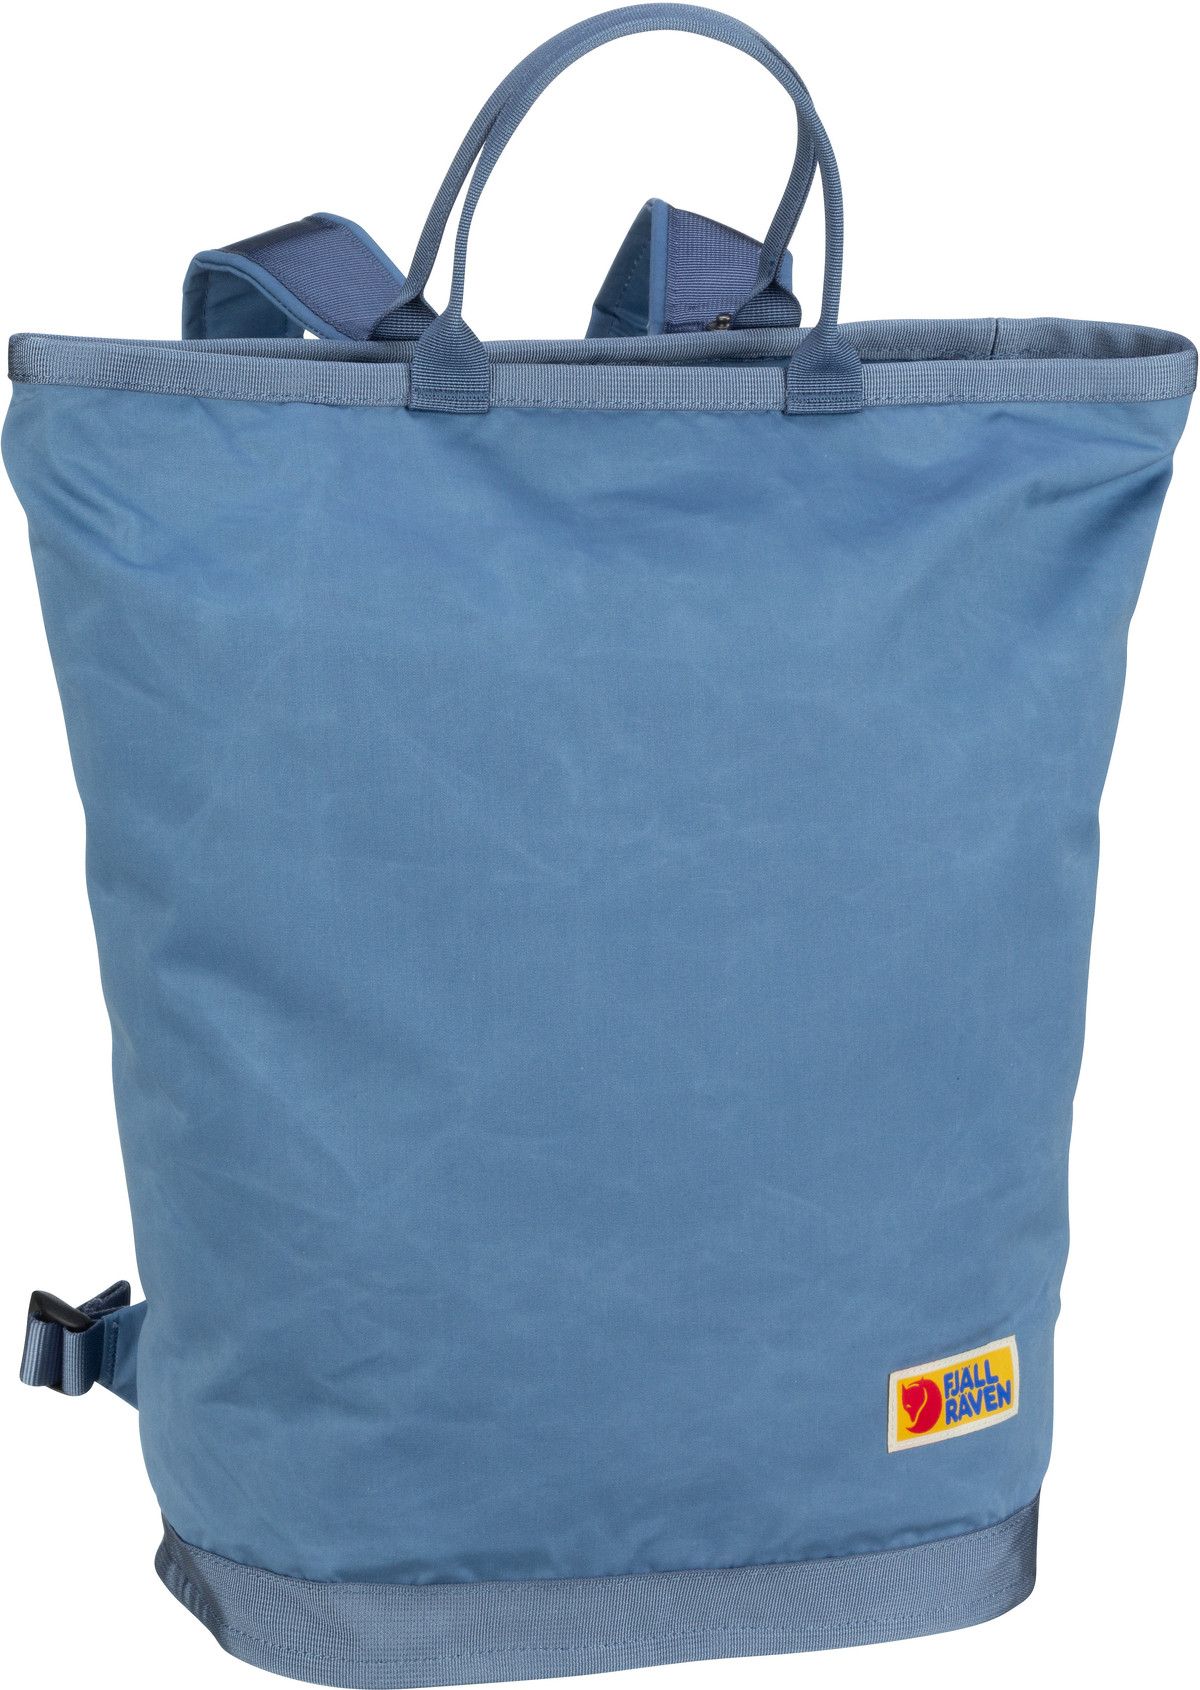 Rucksack / Daypack Vardag Totepack Blue Ridge (20 Liter)